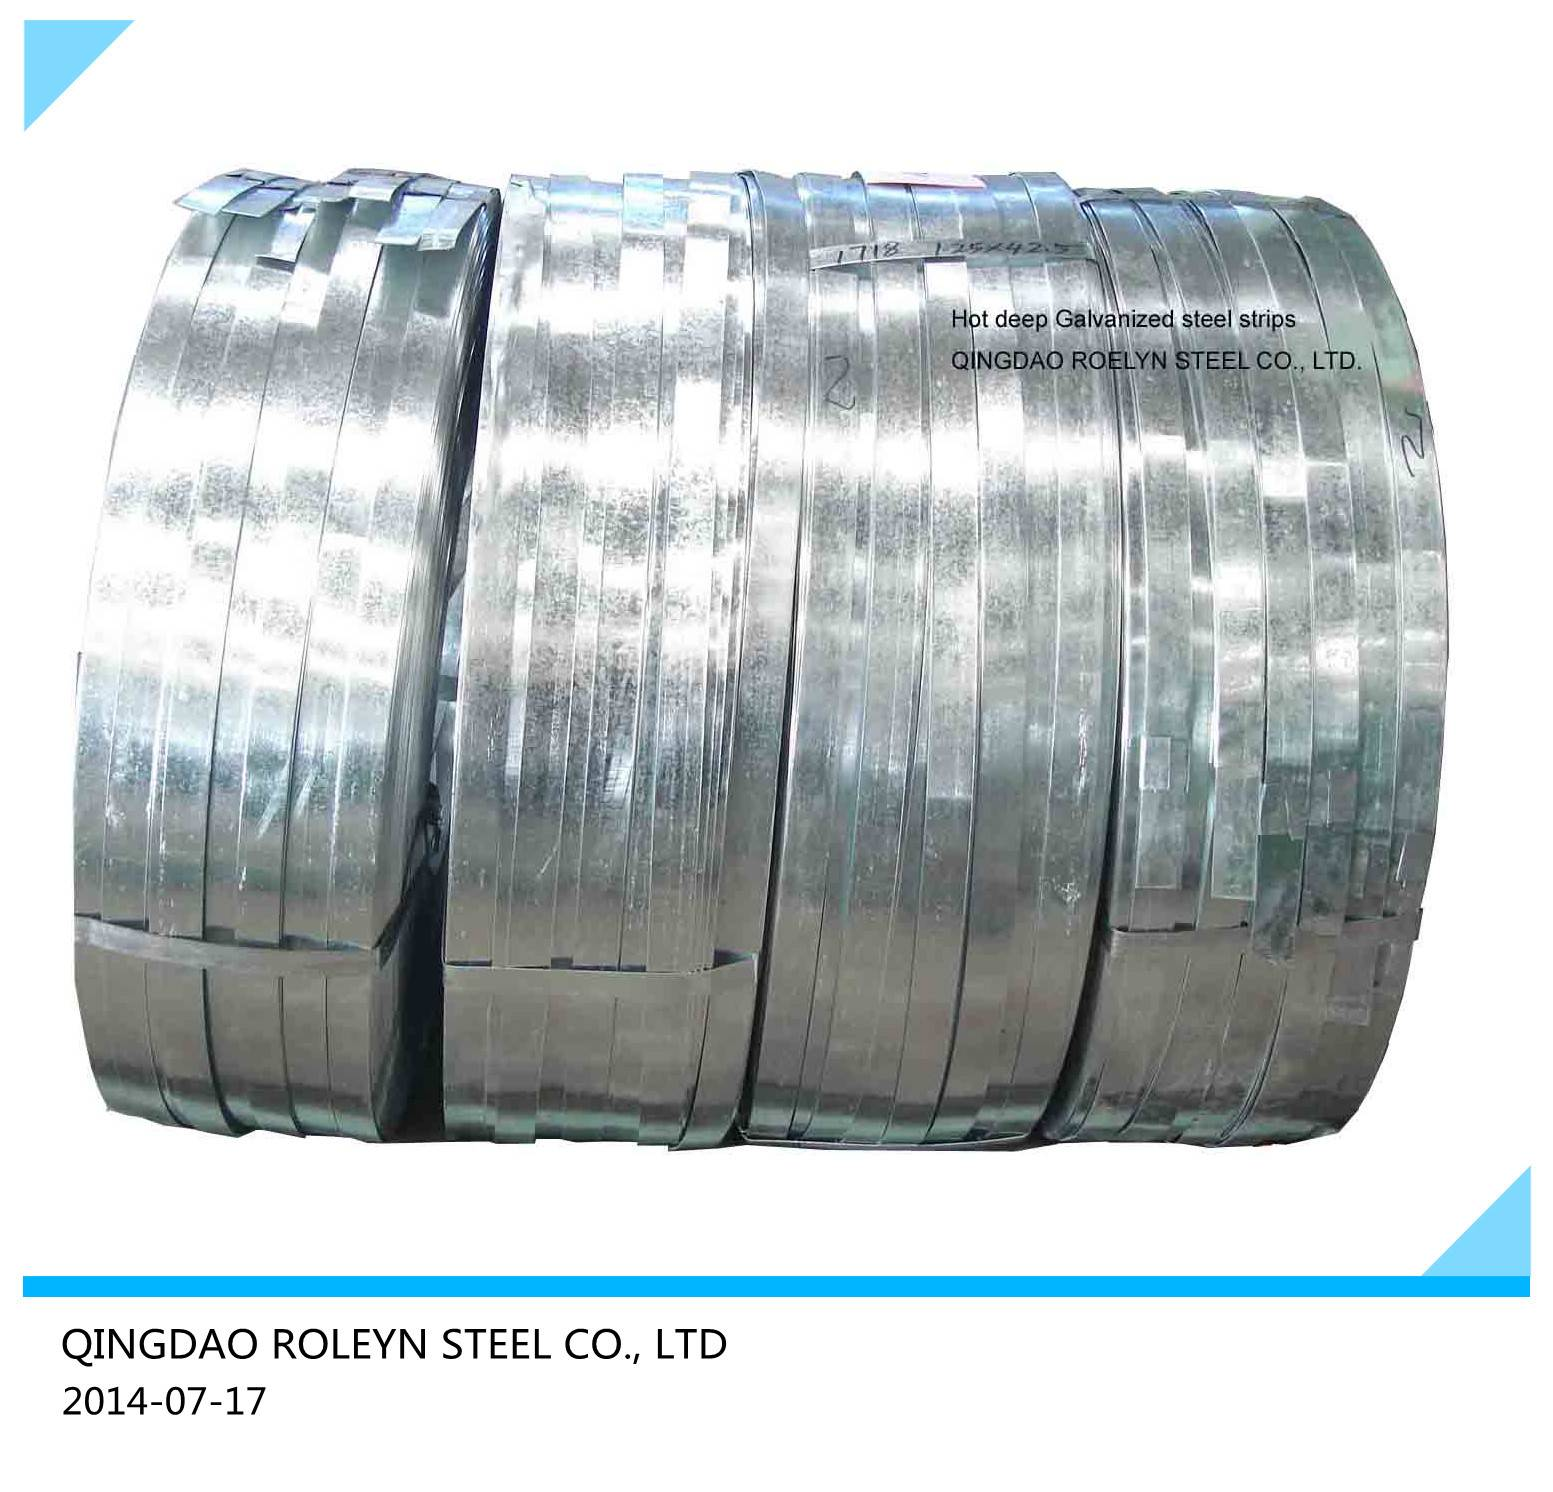 DX51D Z120 Galvanized steel strips